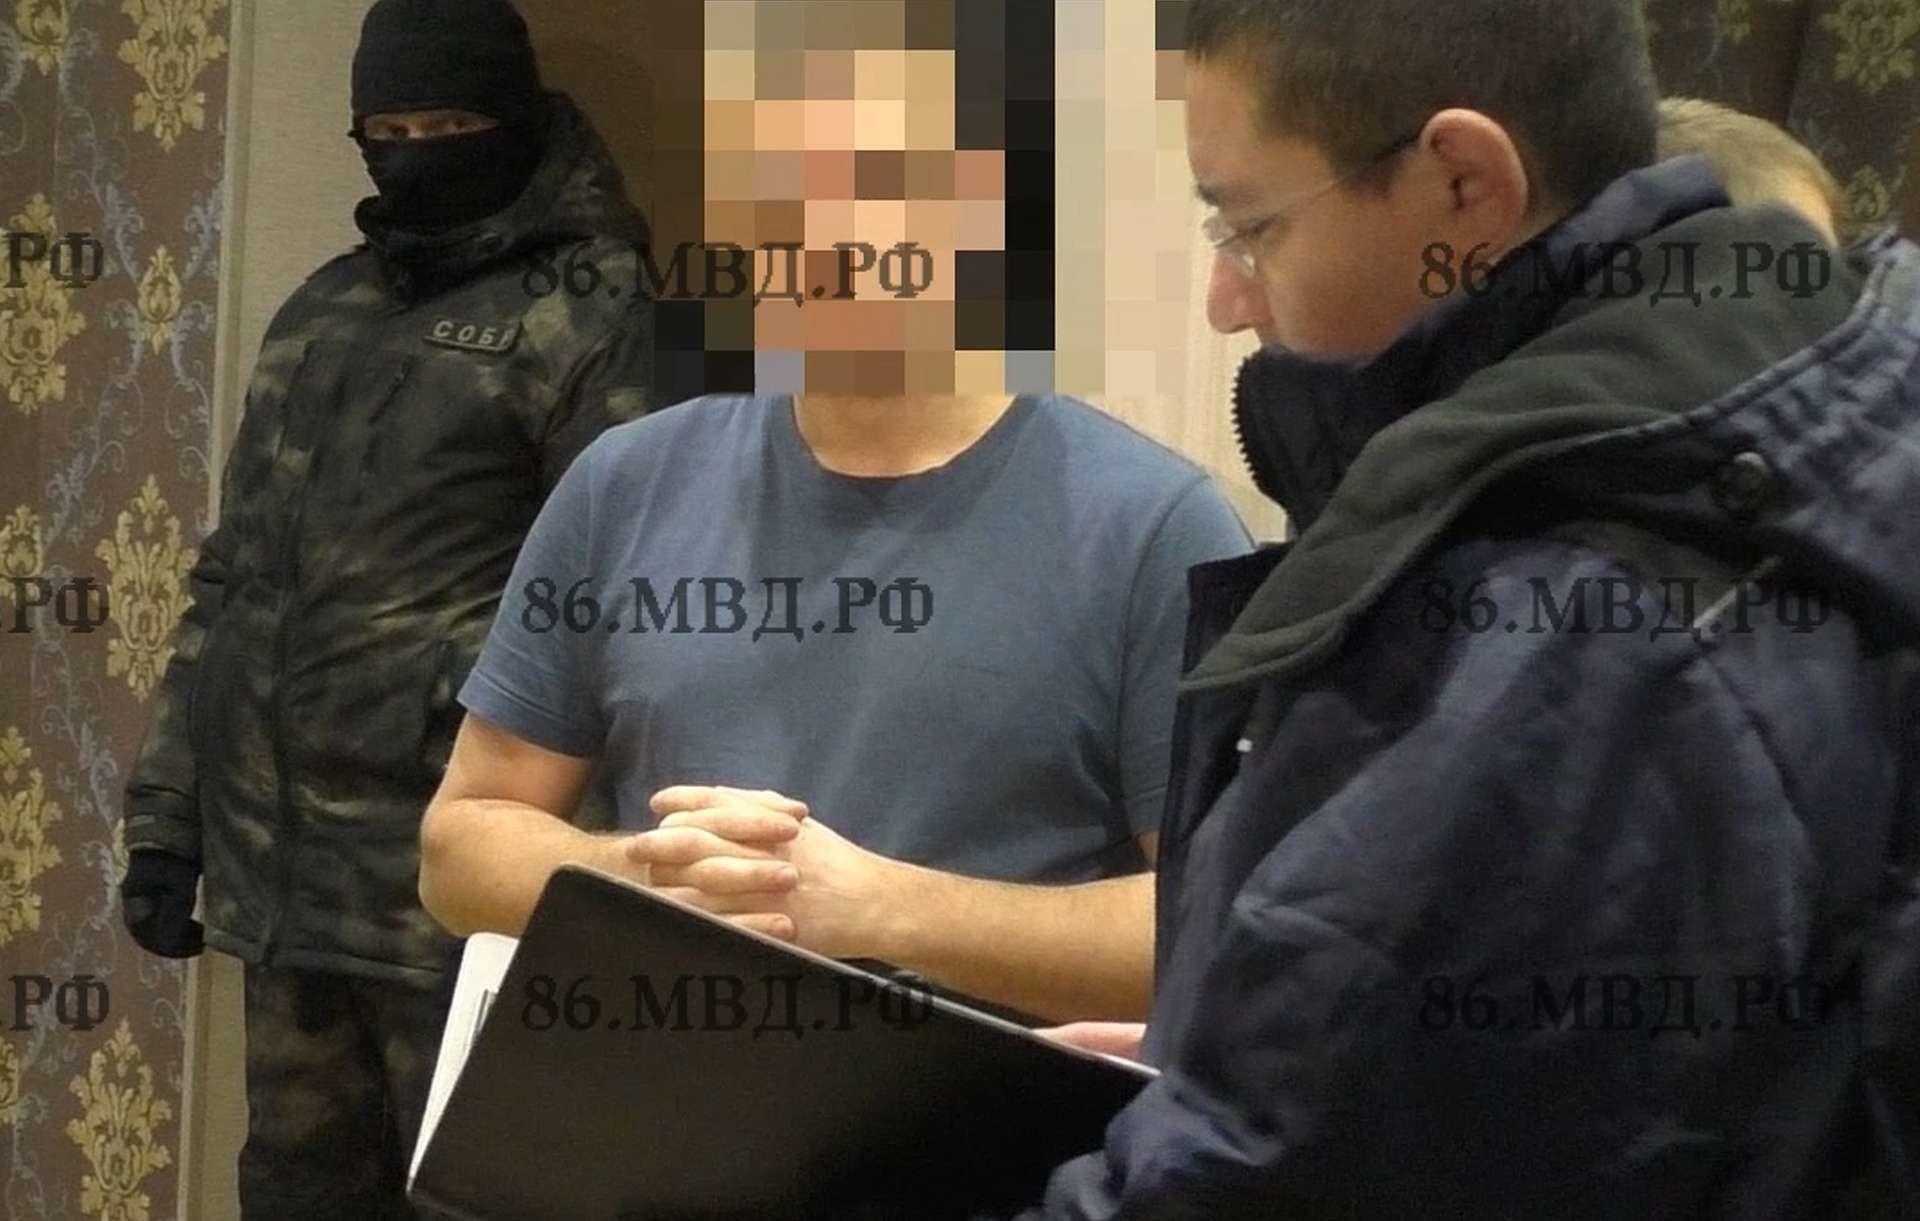 <p>Фото: &copy; Пресс-служба УМВД России по ХМАО &mdash; Югре</p>